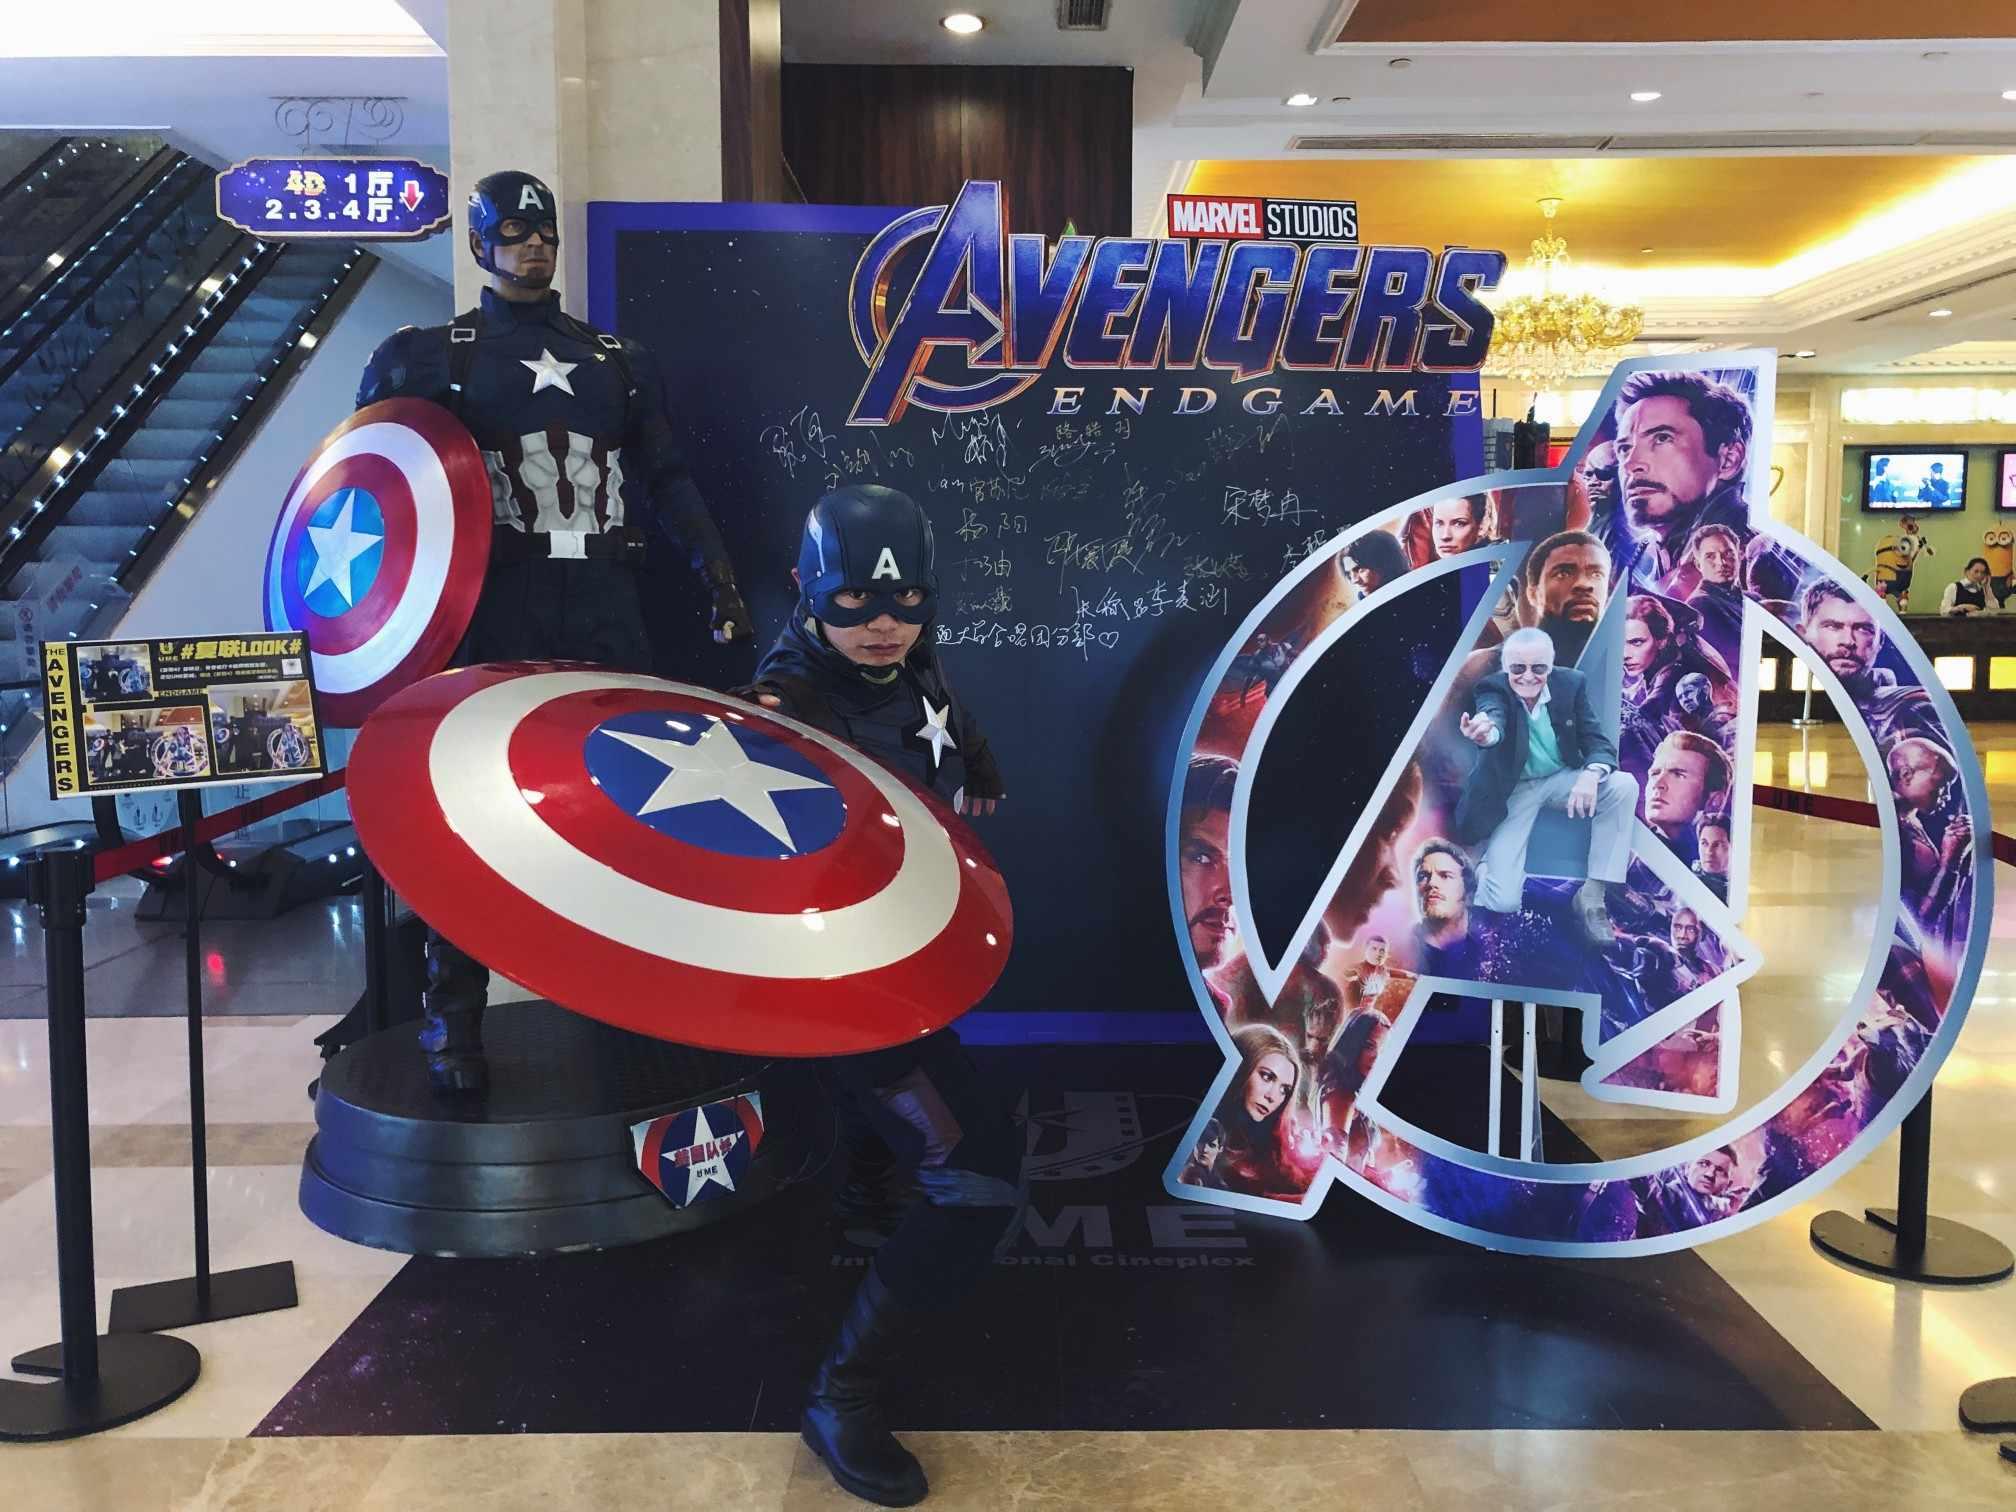 [Lucu] 1:1 Wearable Electromagnetic Belt Captain America Shield Model Adsorpsi Magnetik Prop Cosplay Pesta Kostum